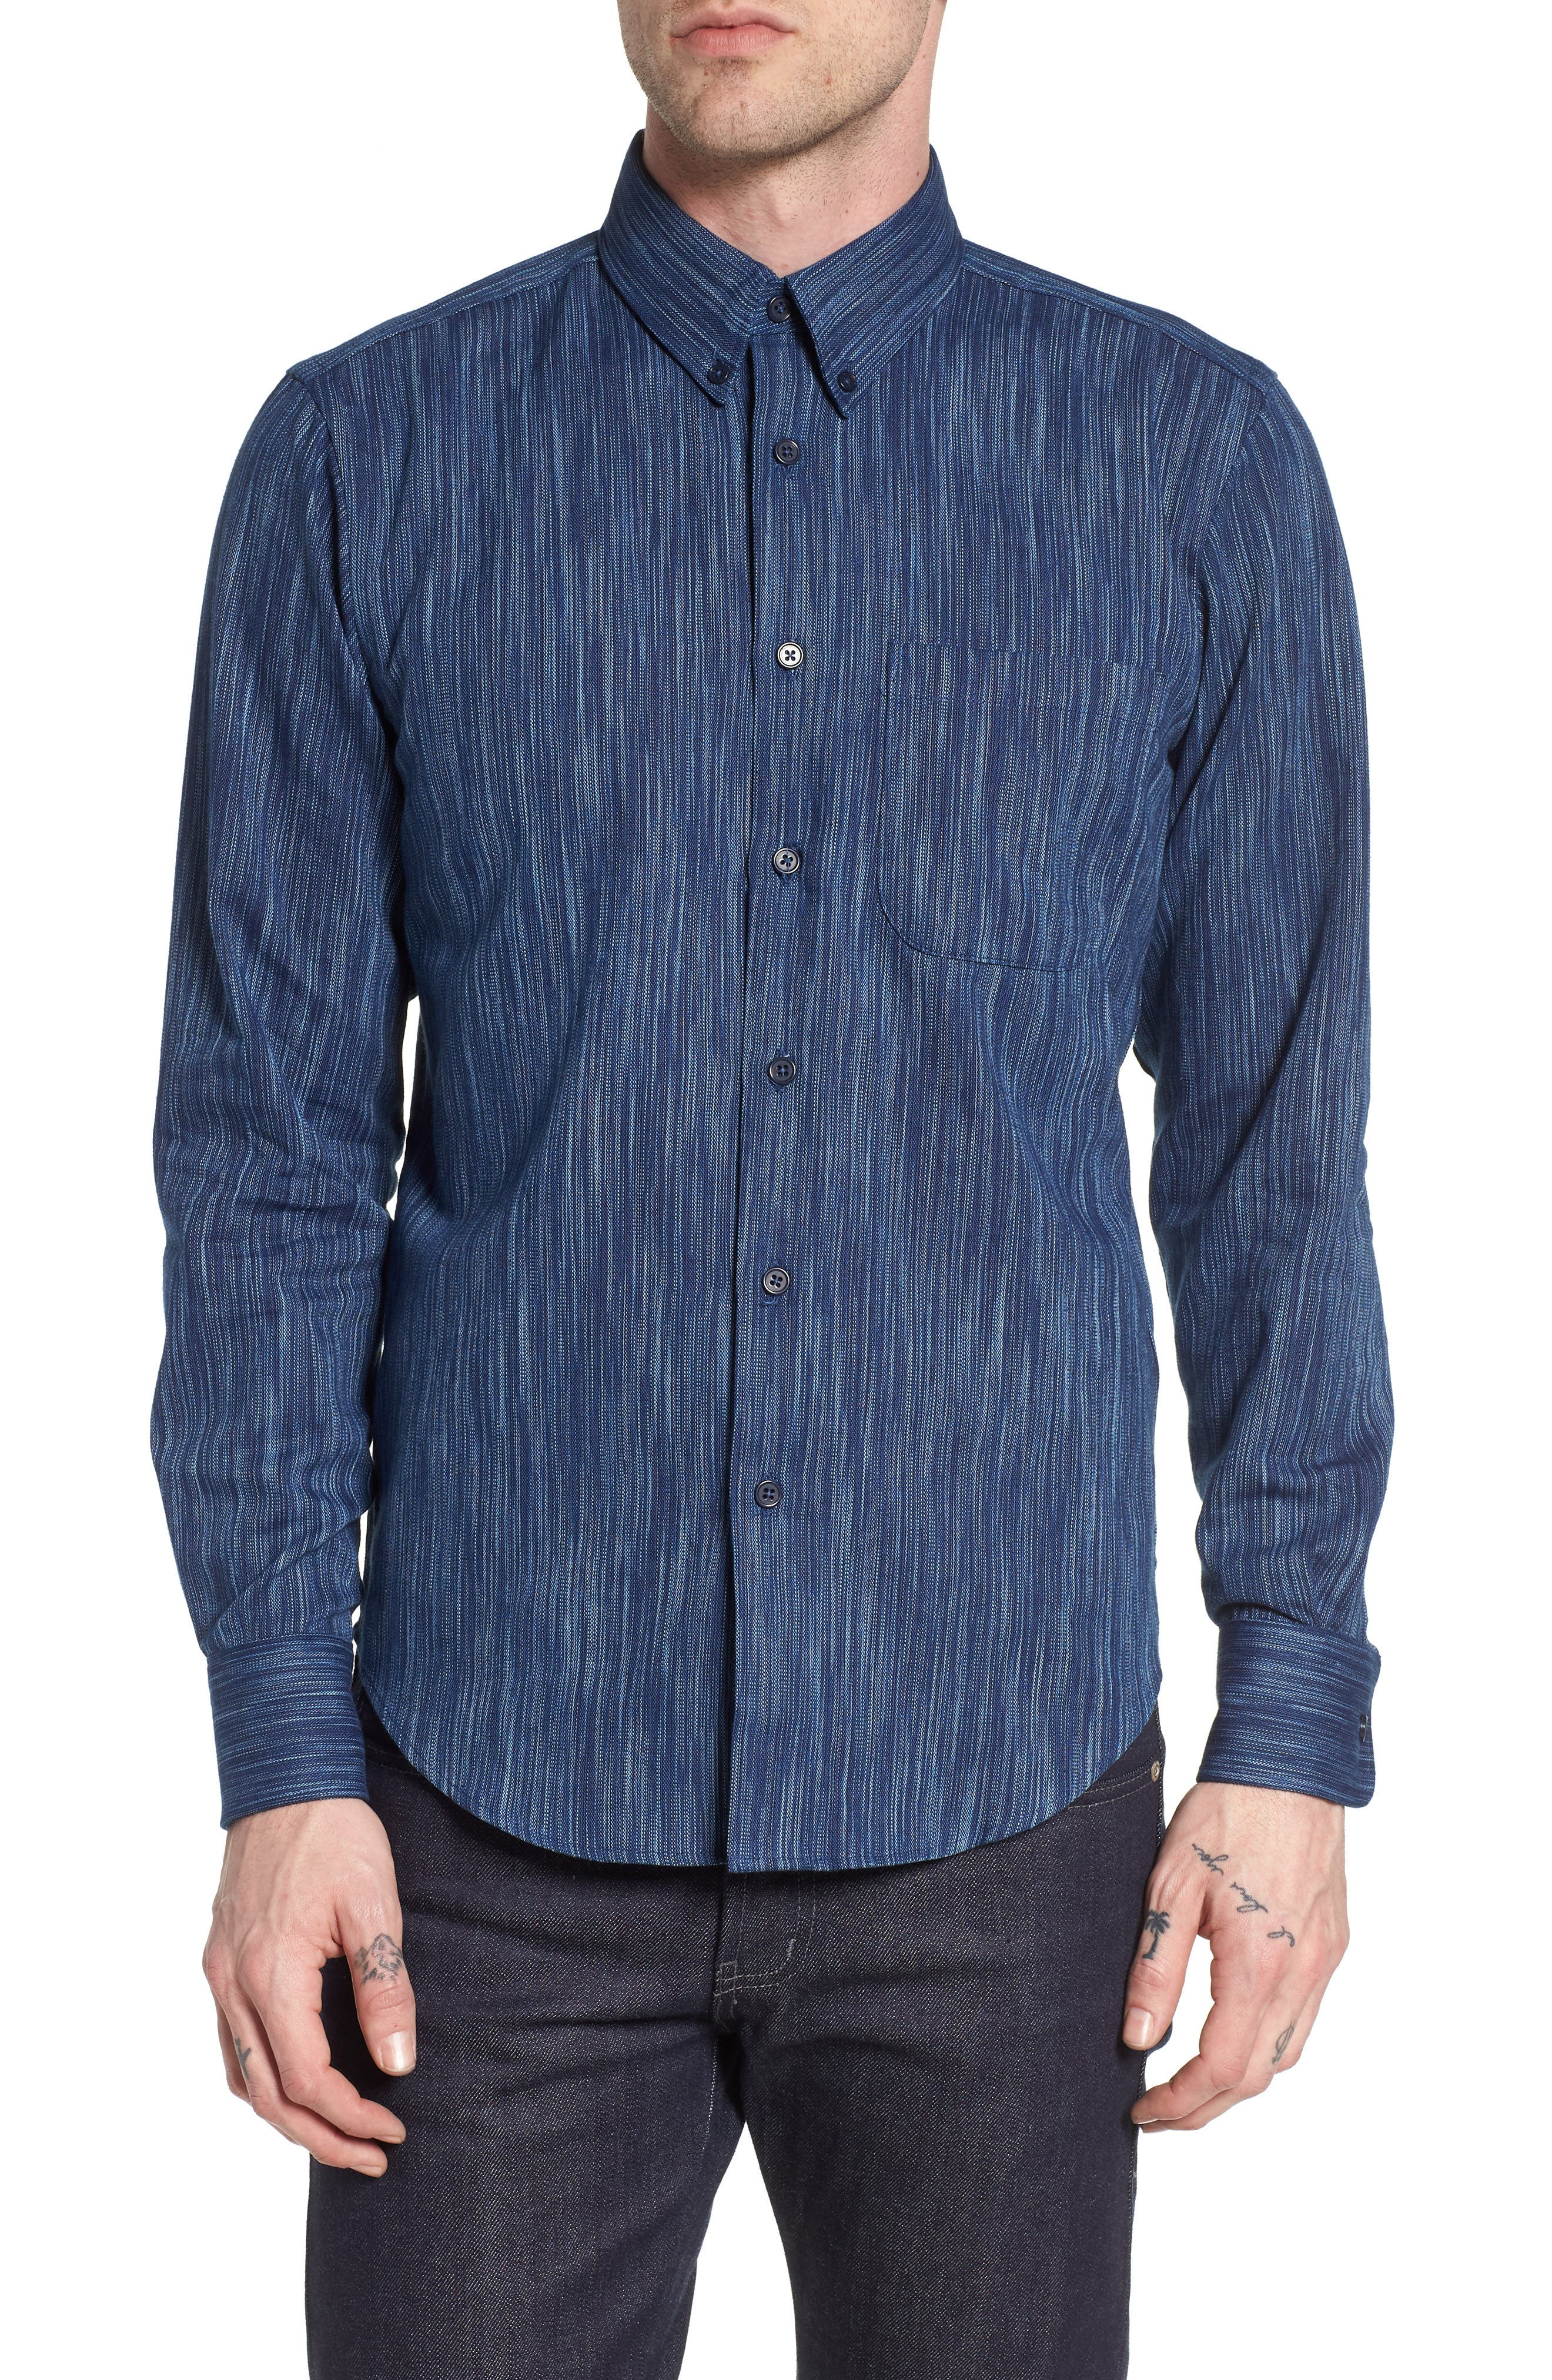 Naked & Famous Denim Indigo Tie Dye Rain Weave Shirt